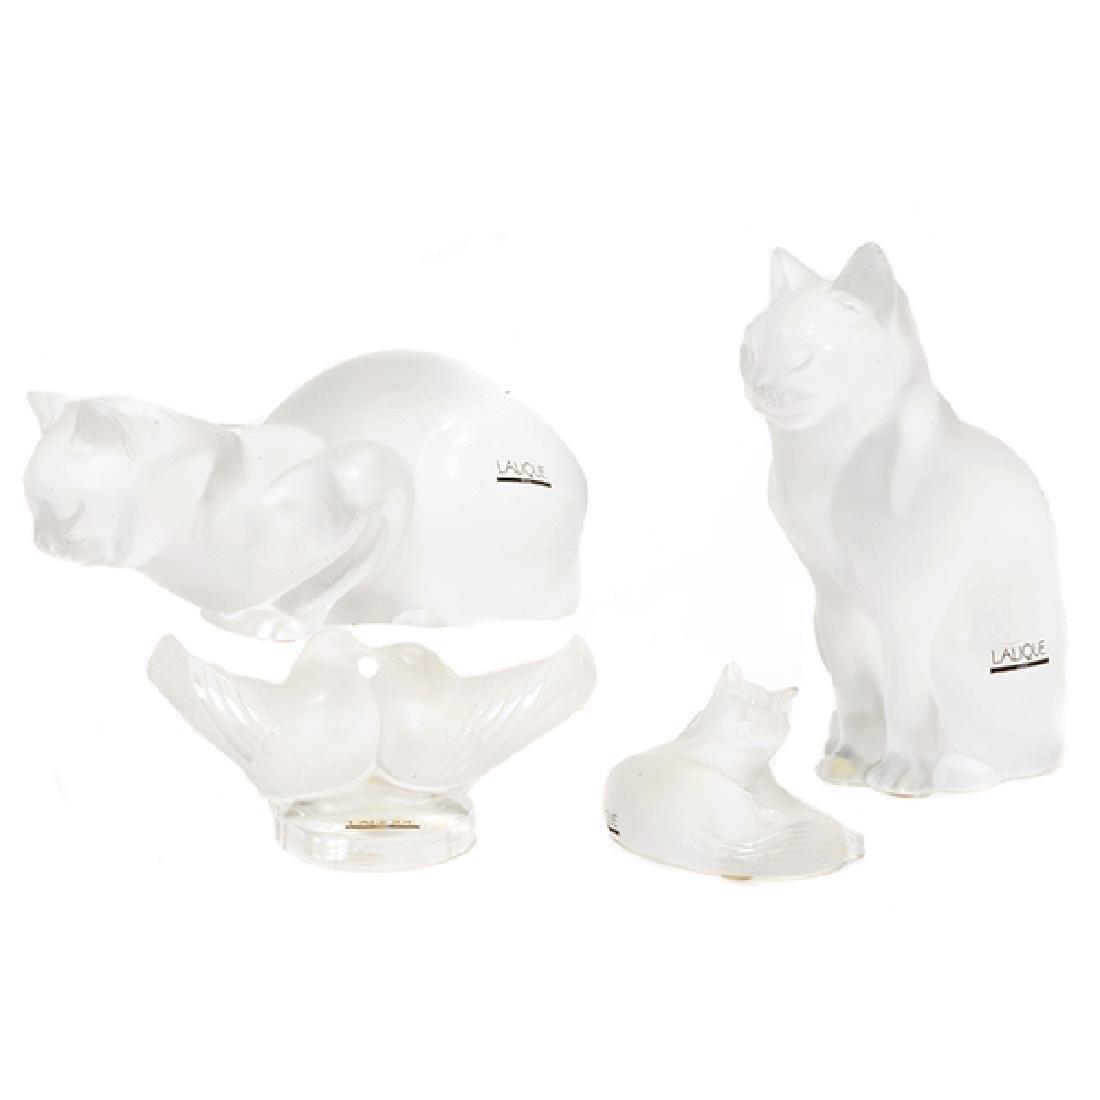 Four Lalique France Animal Figures